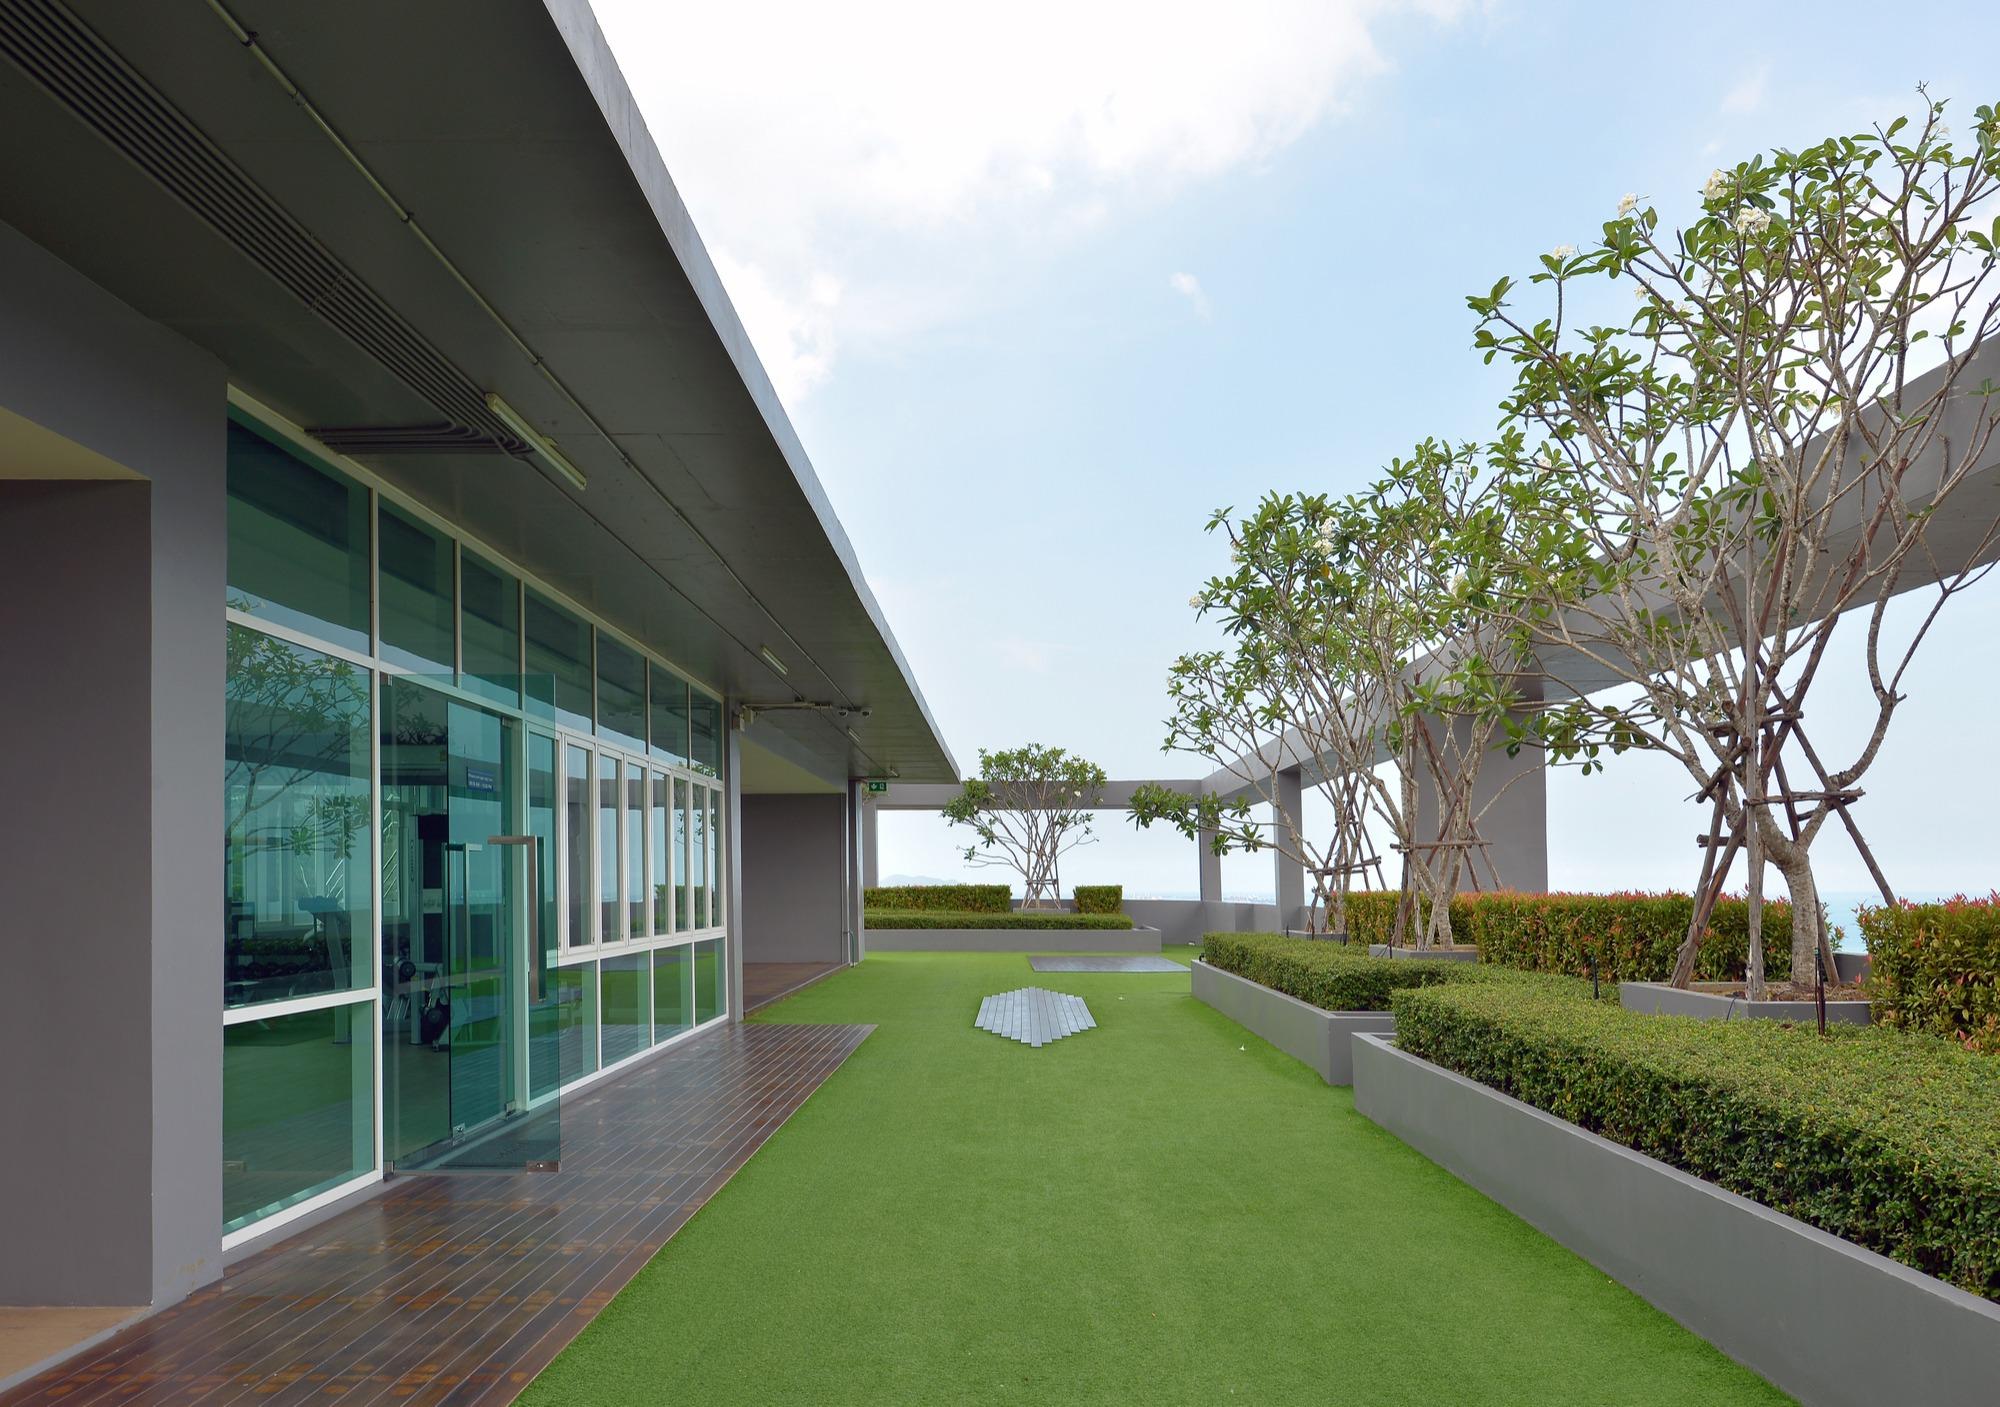 artificial turf rooftop